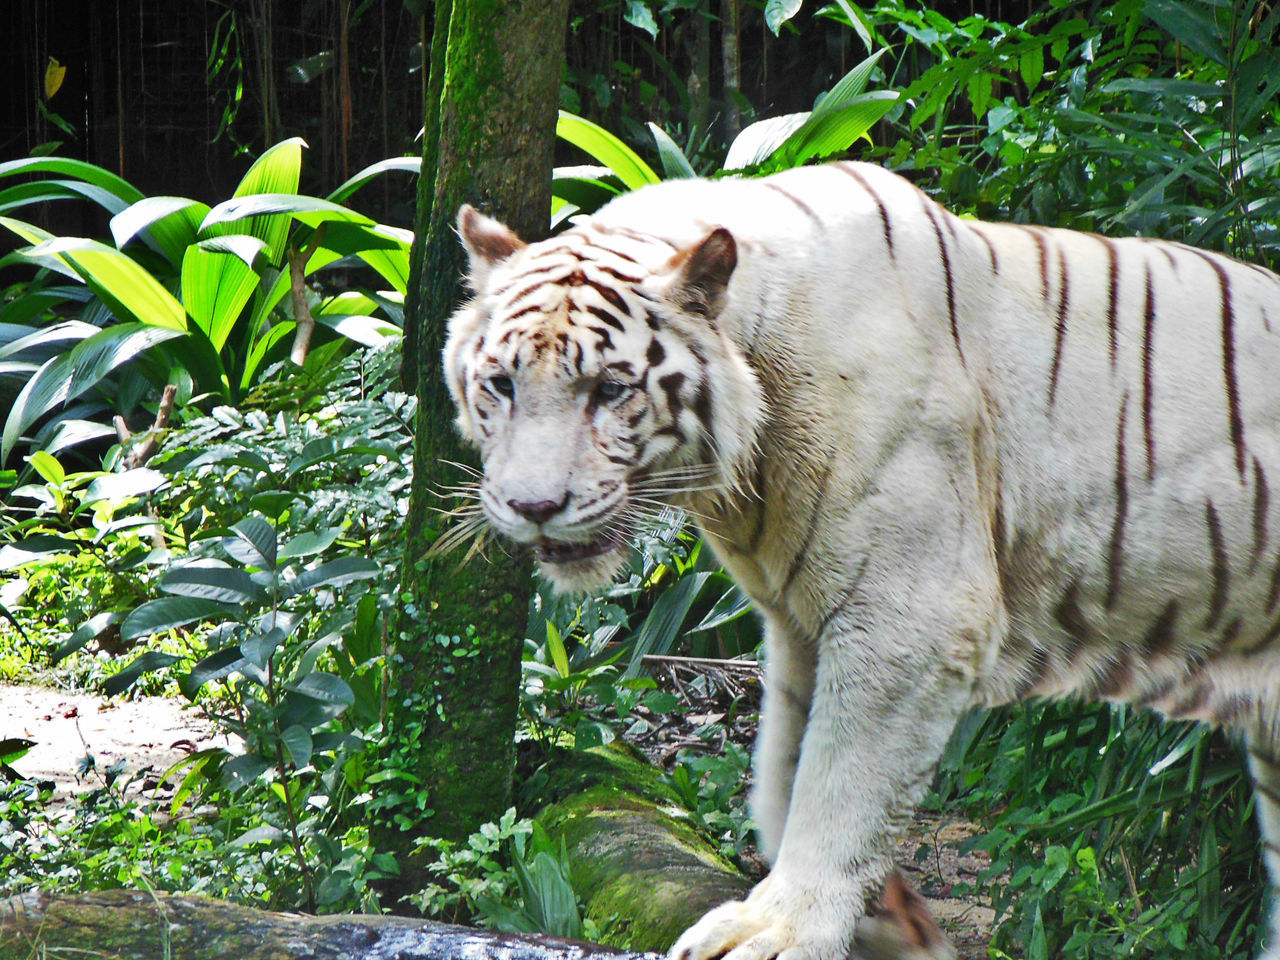 Animal Themes Animal Wildlife Animals In The Wild Close-up Animal Mammal Nature Singapore Zoological Garden Tiger White Tiger Wild Life